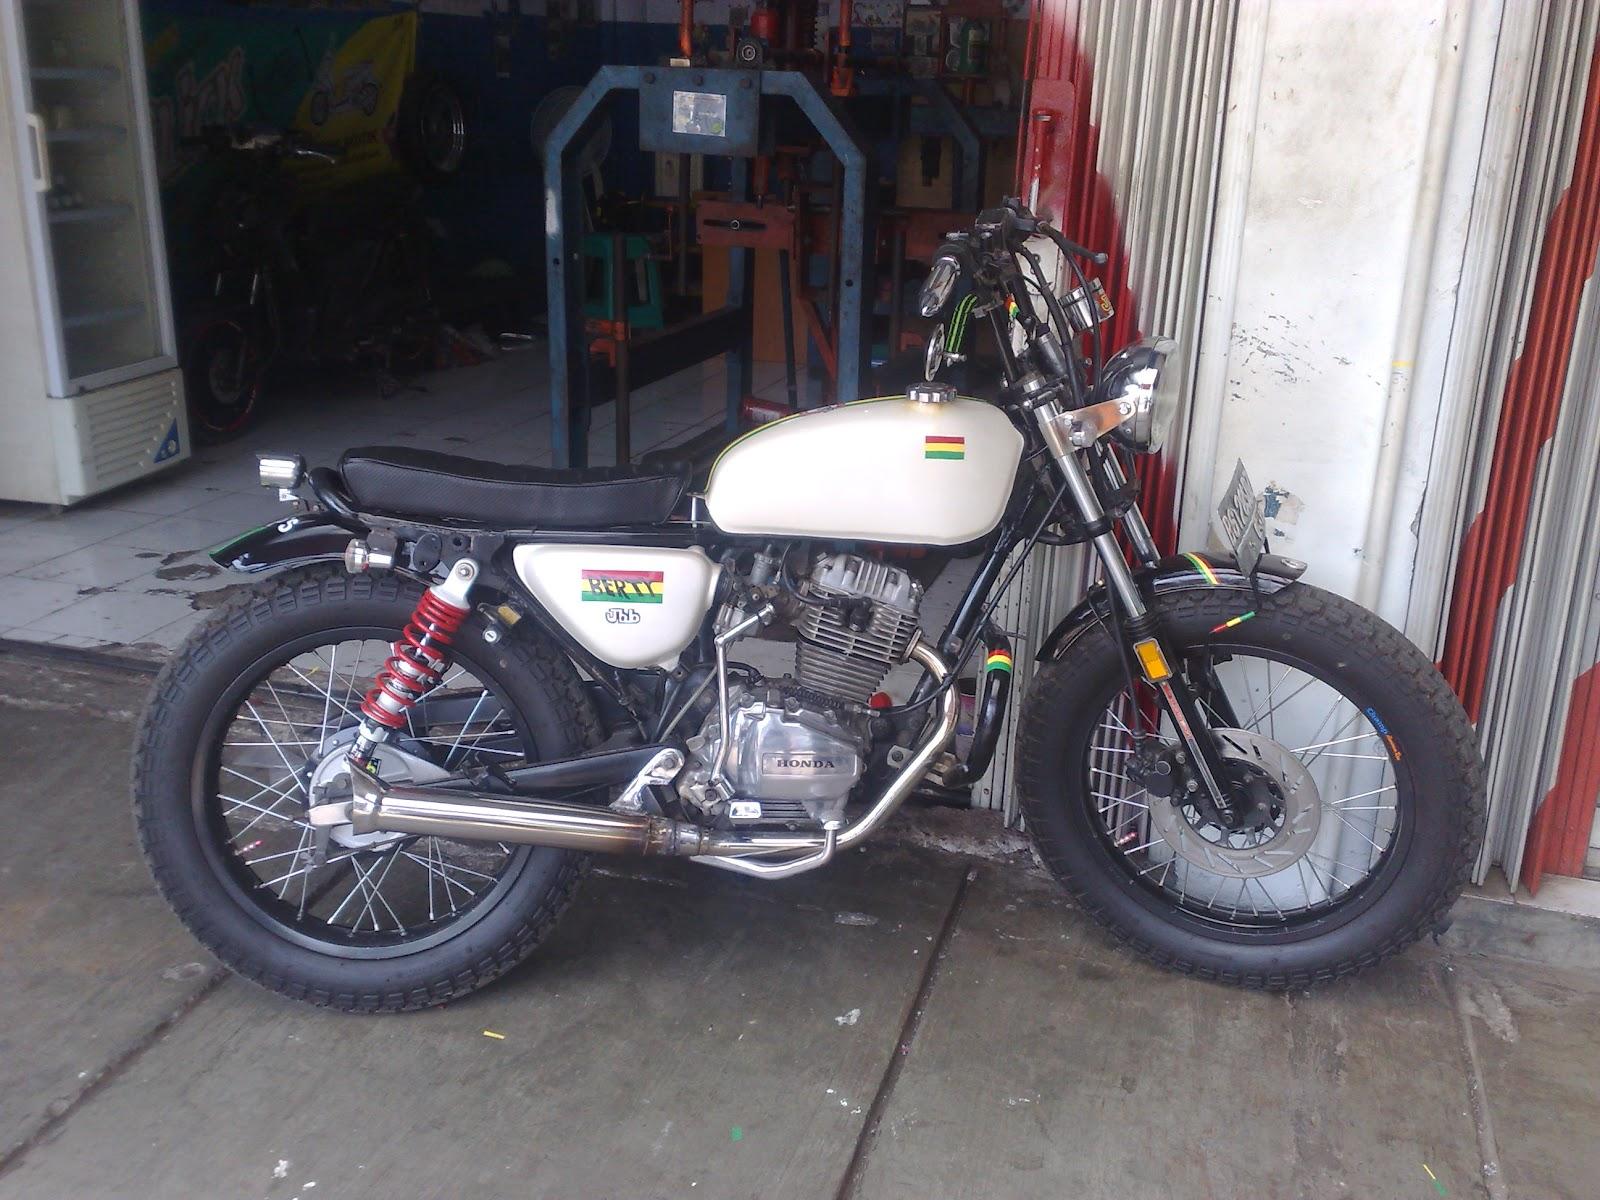 103 Modifikasi Motor Cb Bandung Modifikasi Motor Honda CB Terbaru